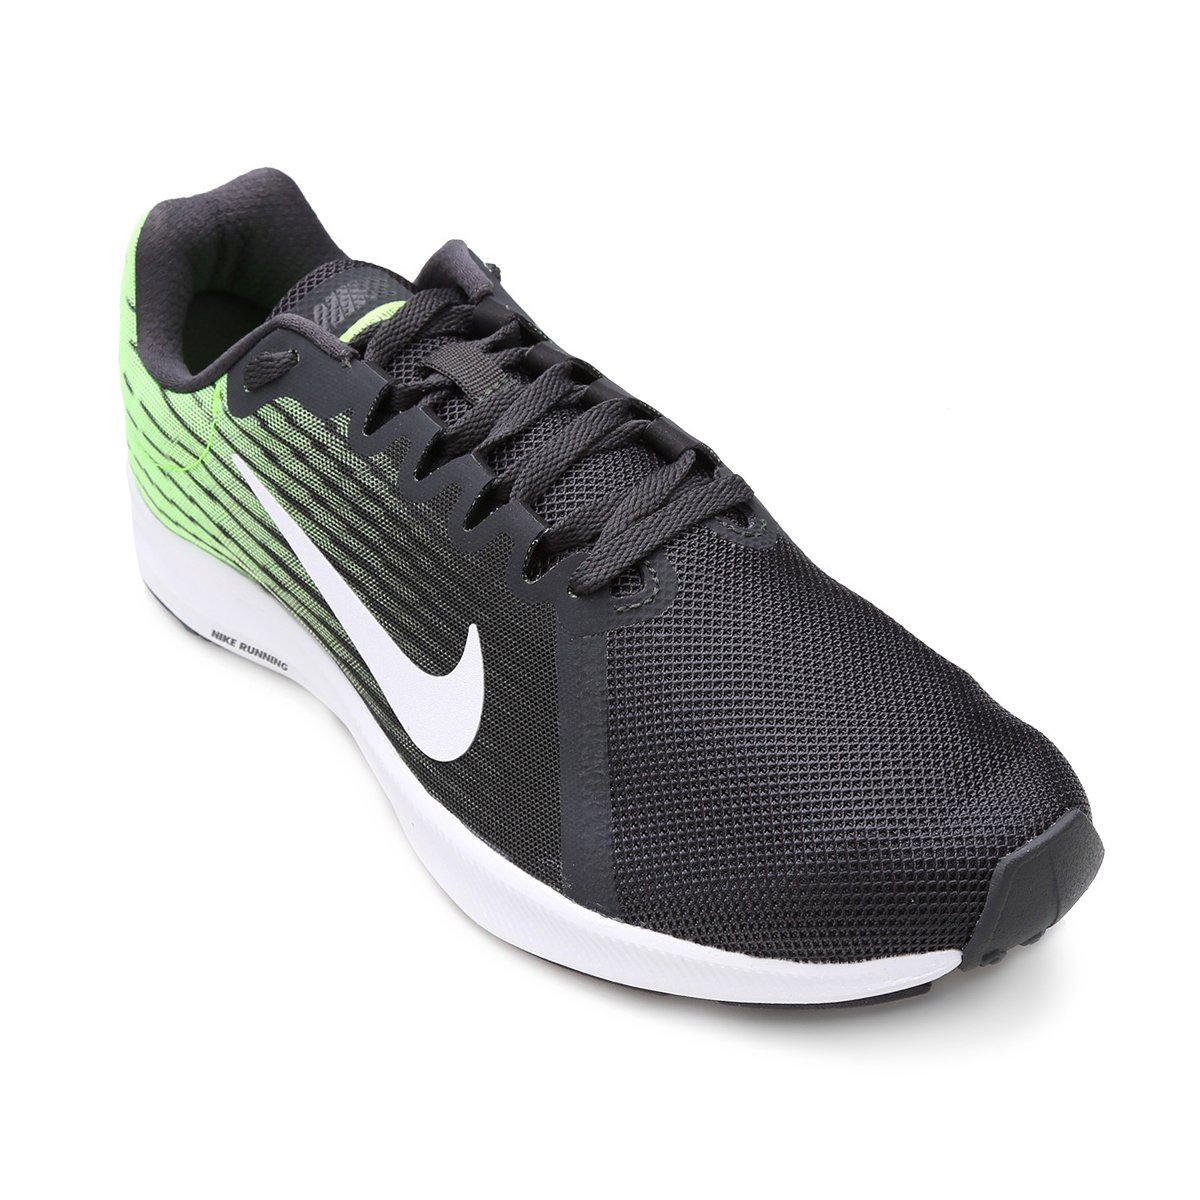 5d6ea3efc8e Tênis Nike Downshifter 8 Masculino - Preto e verde - Compre Agora ...